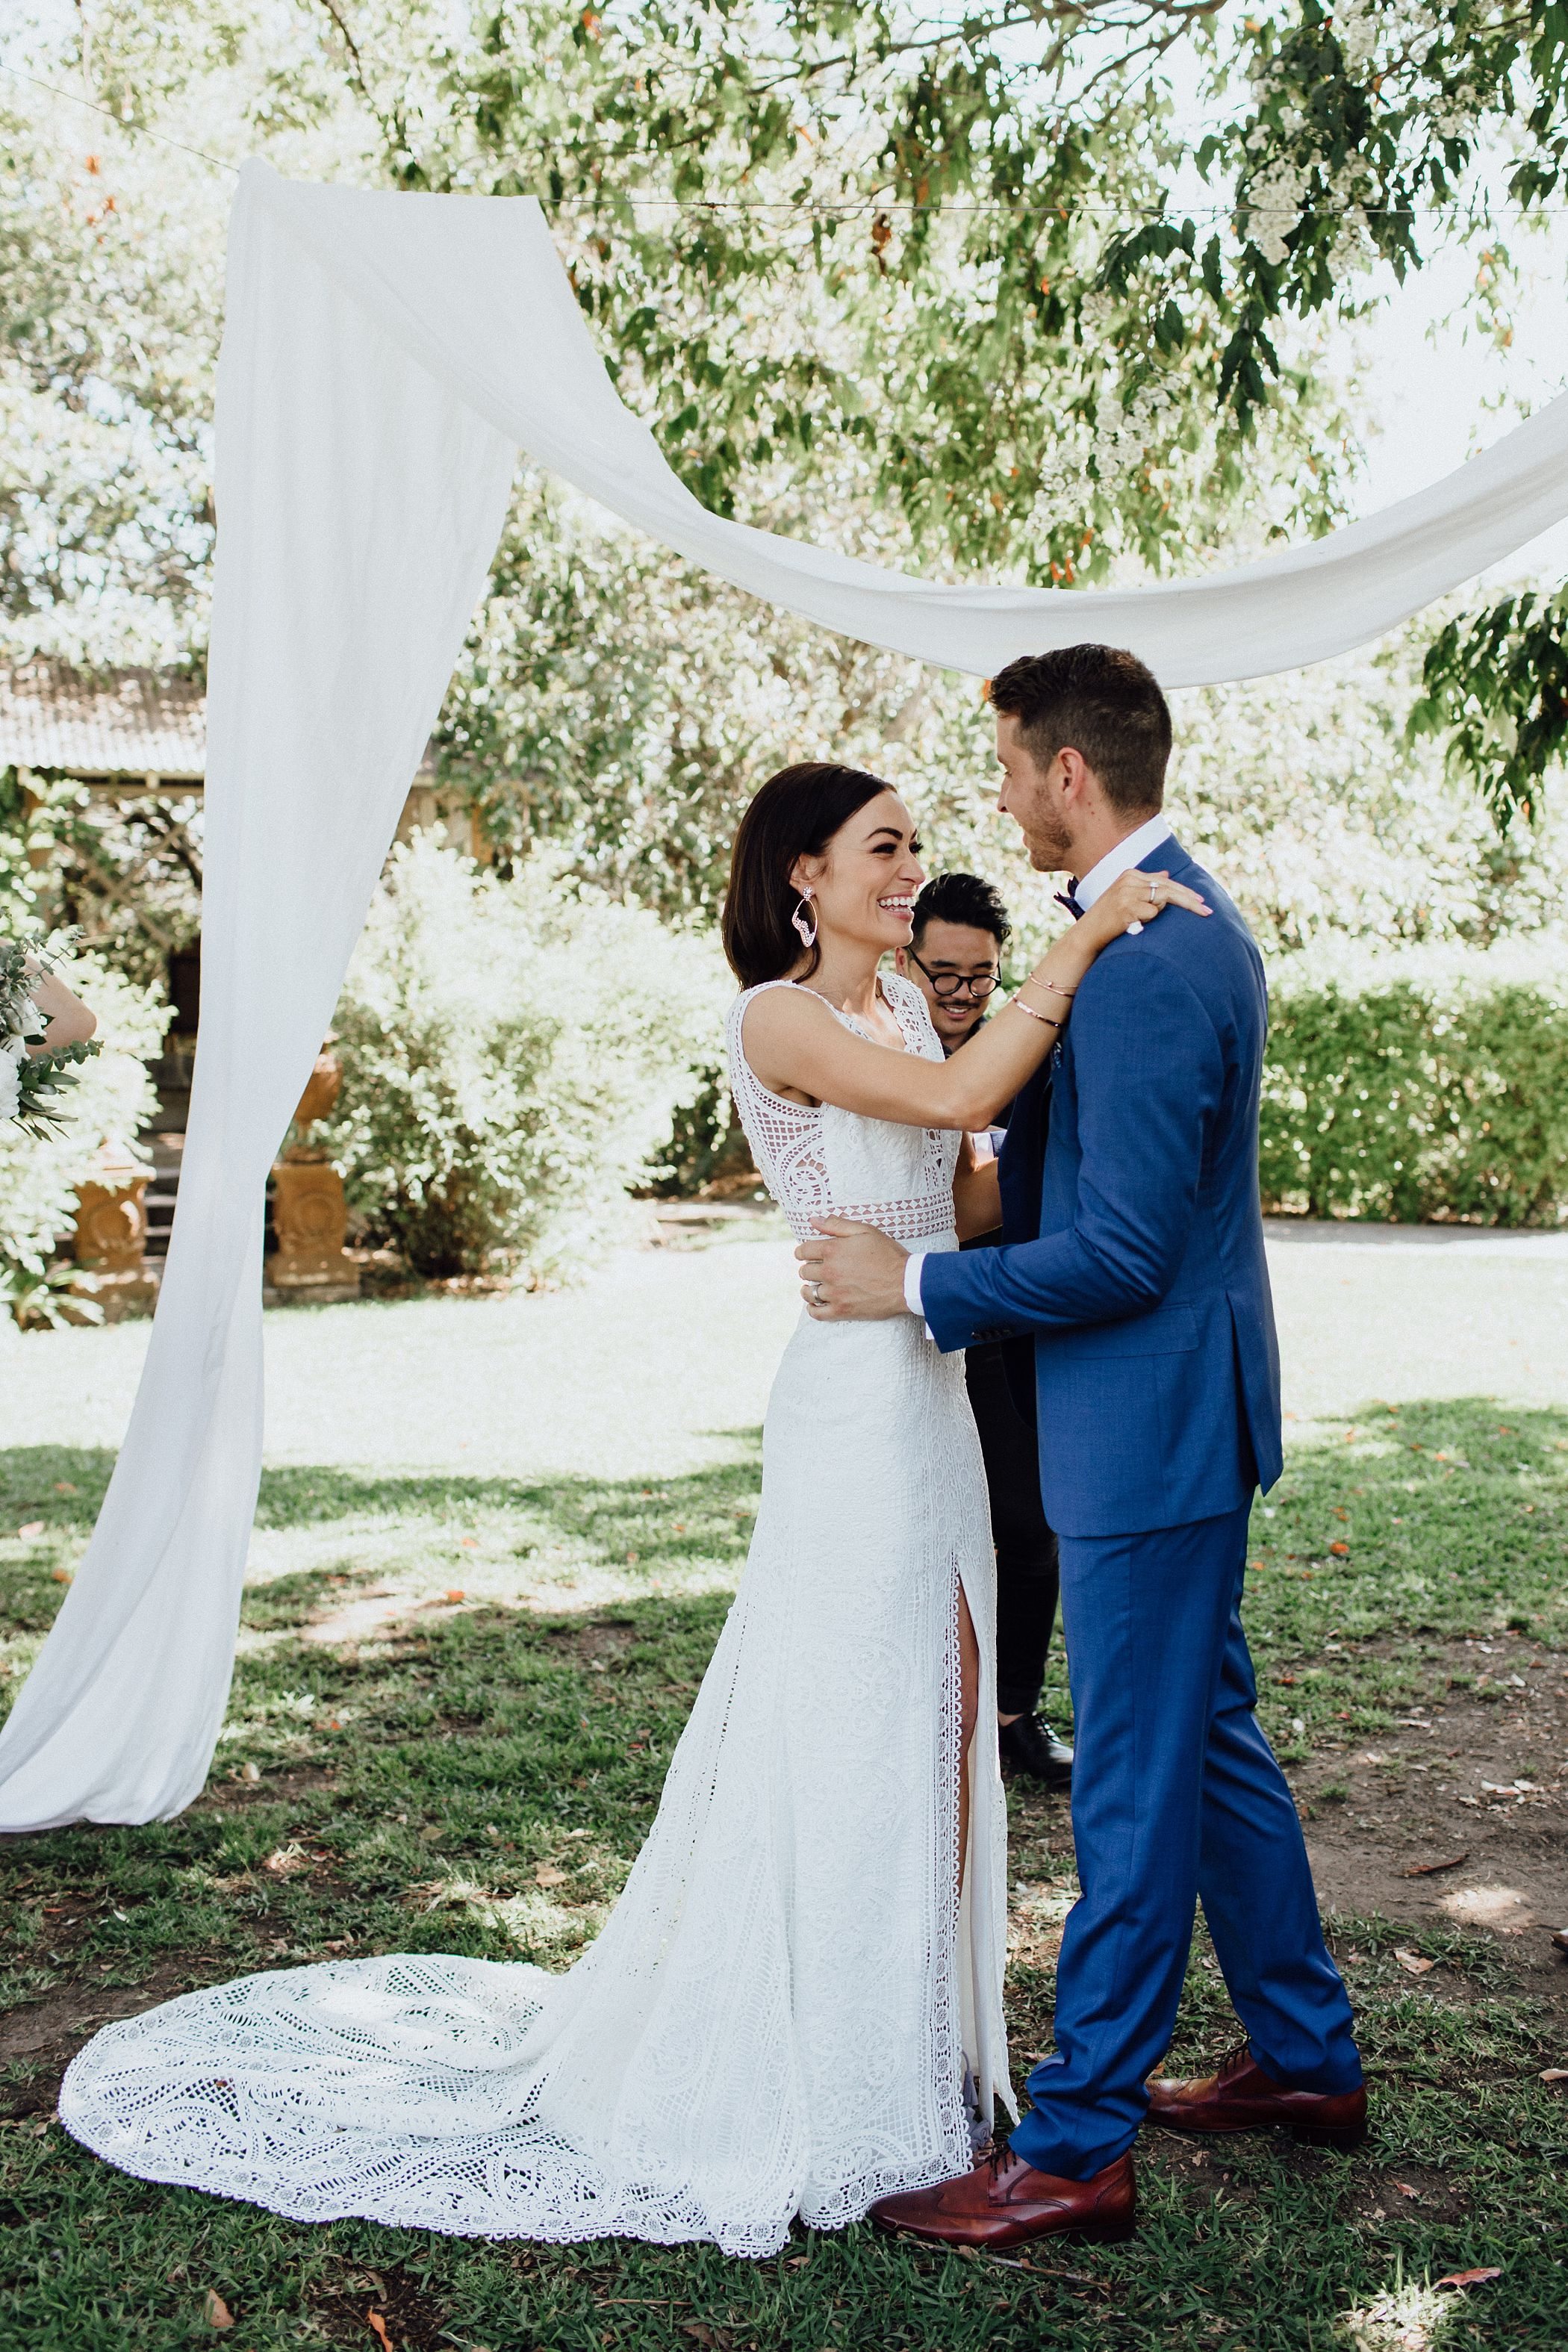 lauren-anne-photography-newcastle-wedding-photographer-mindaribba-house_0036.jpg